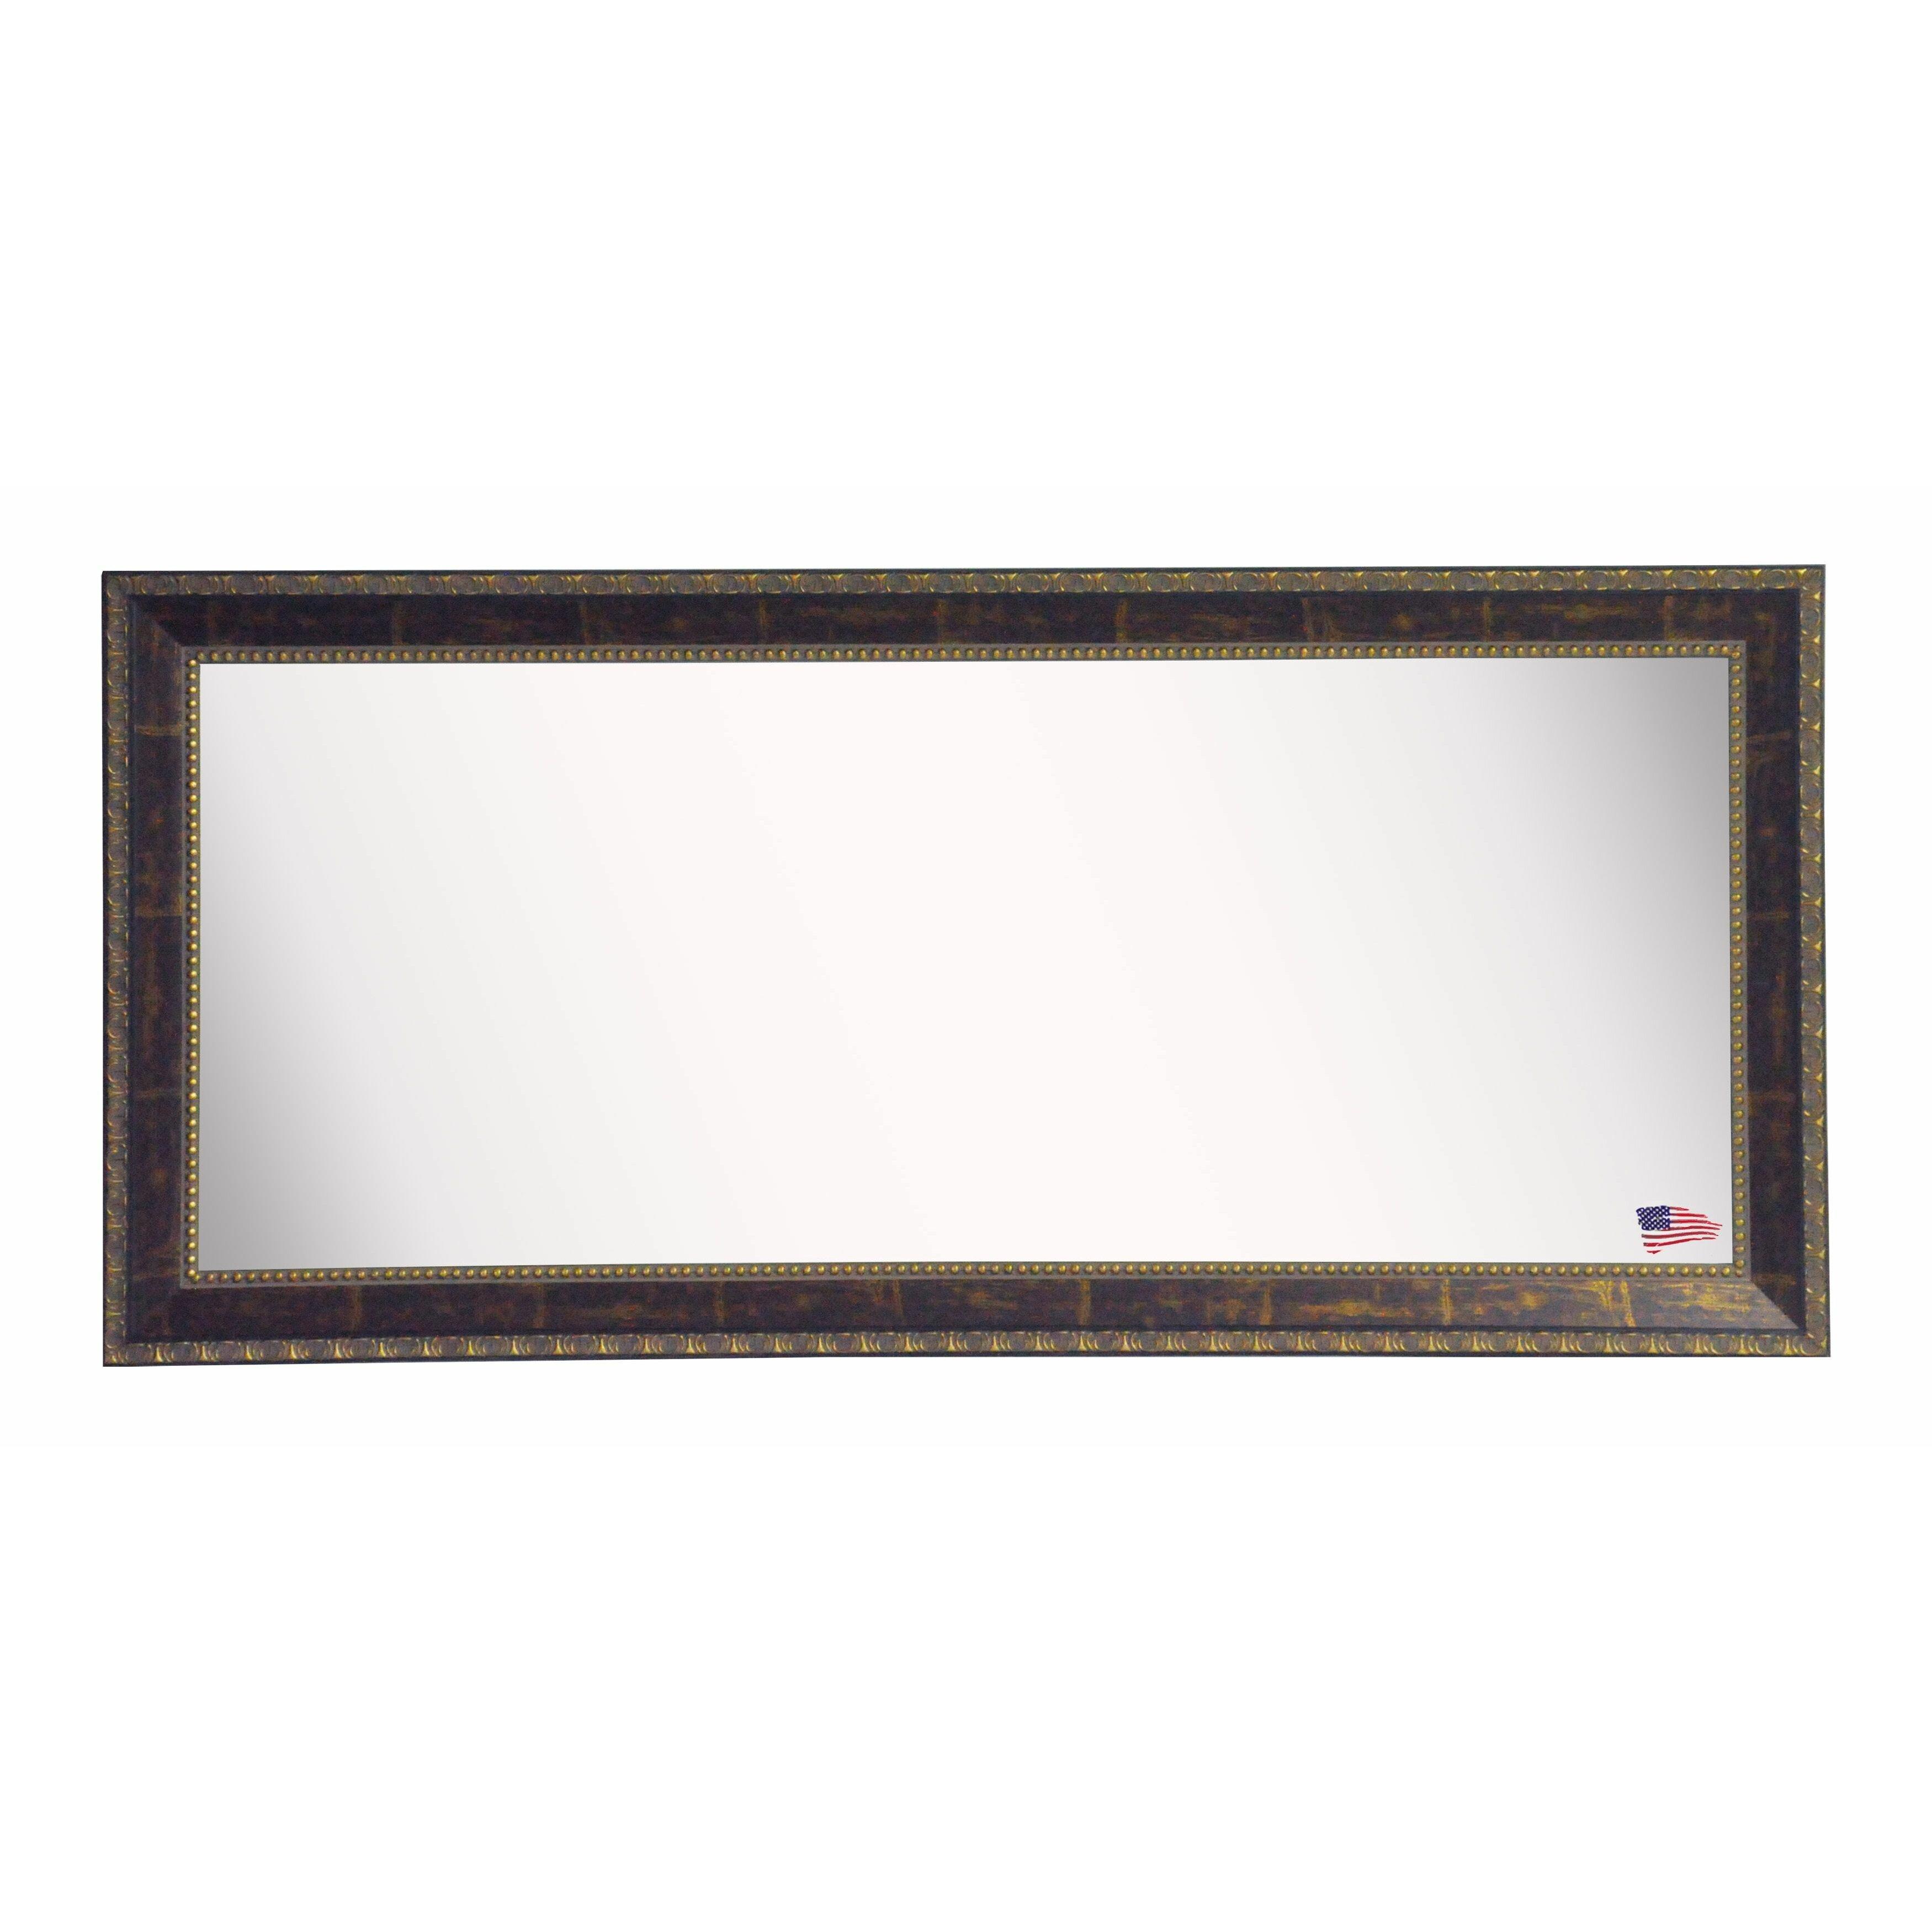 Rayne mirrors double vanity wall mirror amp reviews wayfair